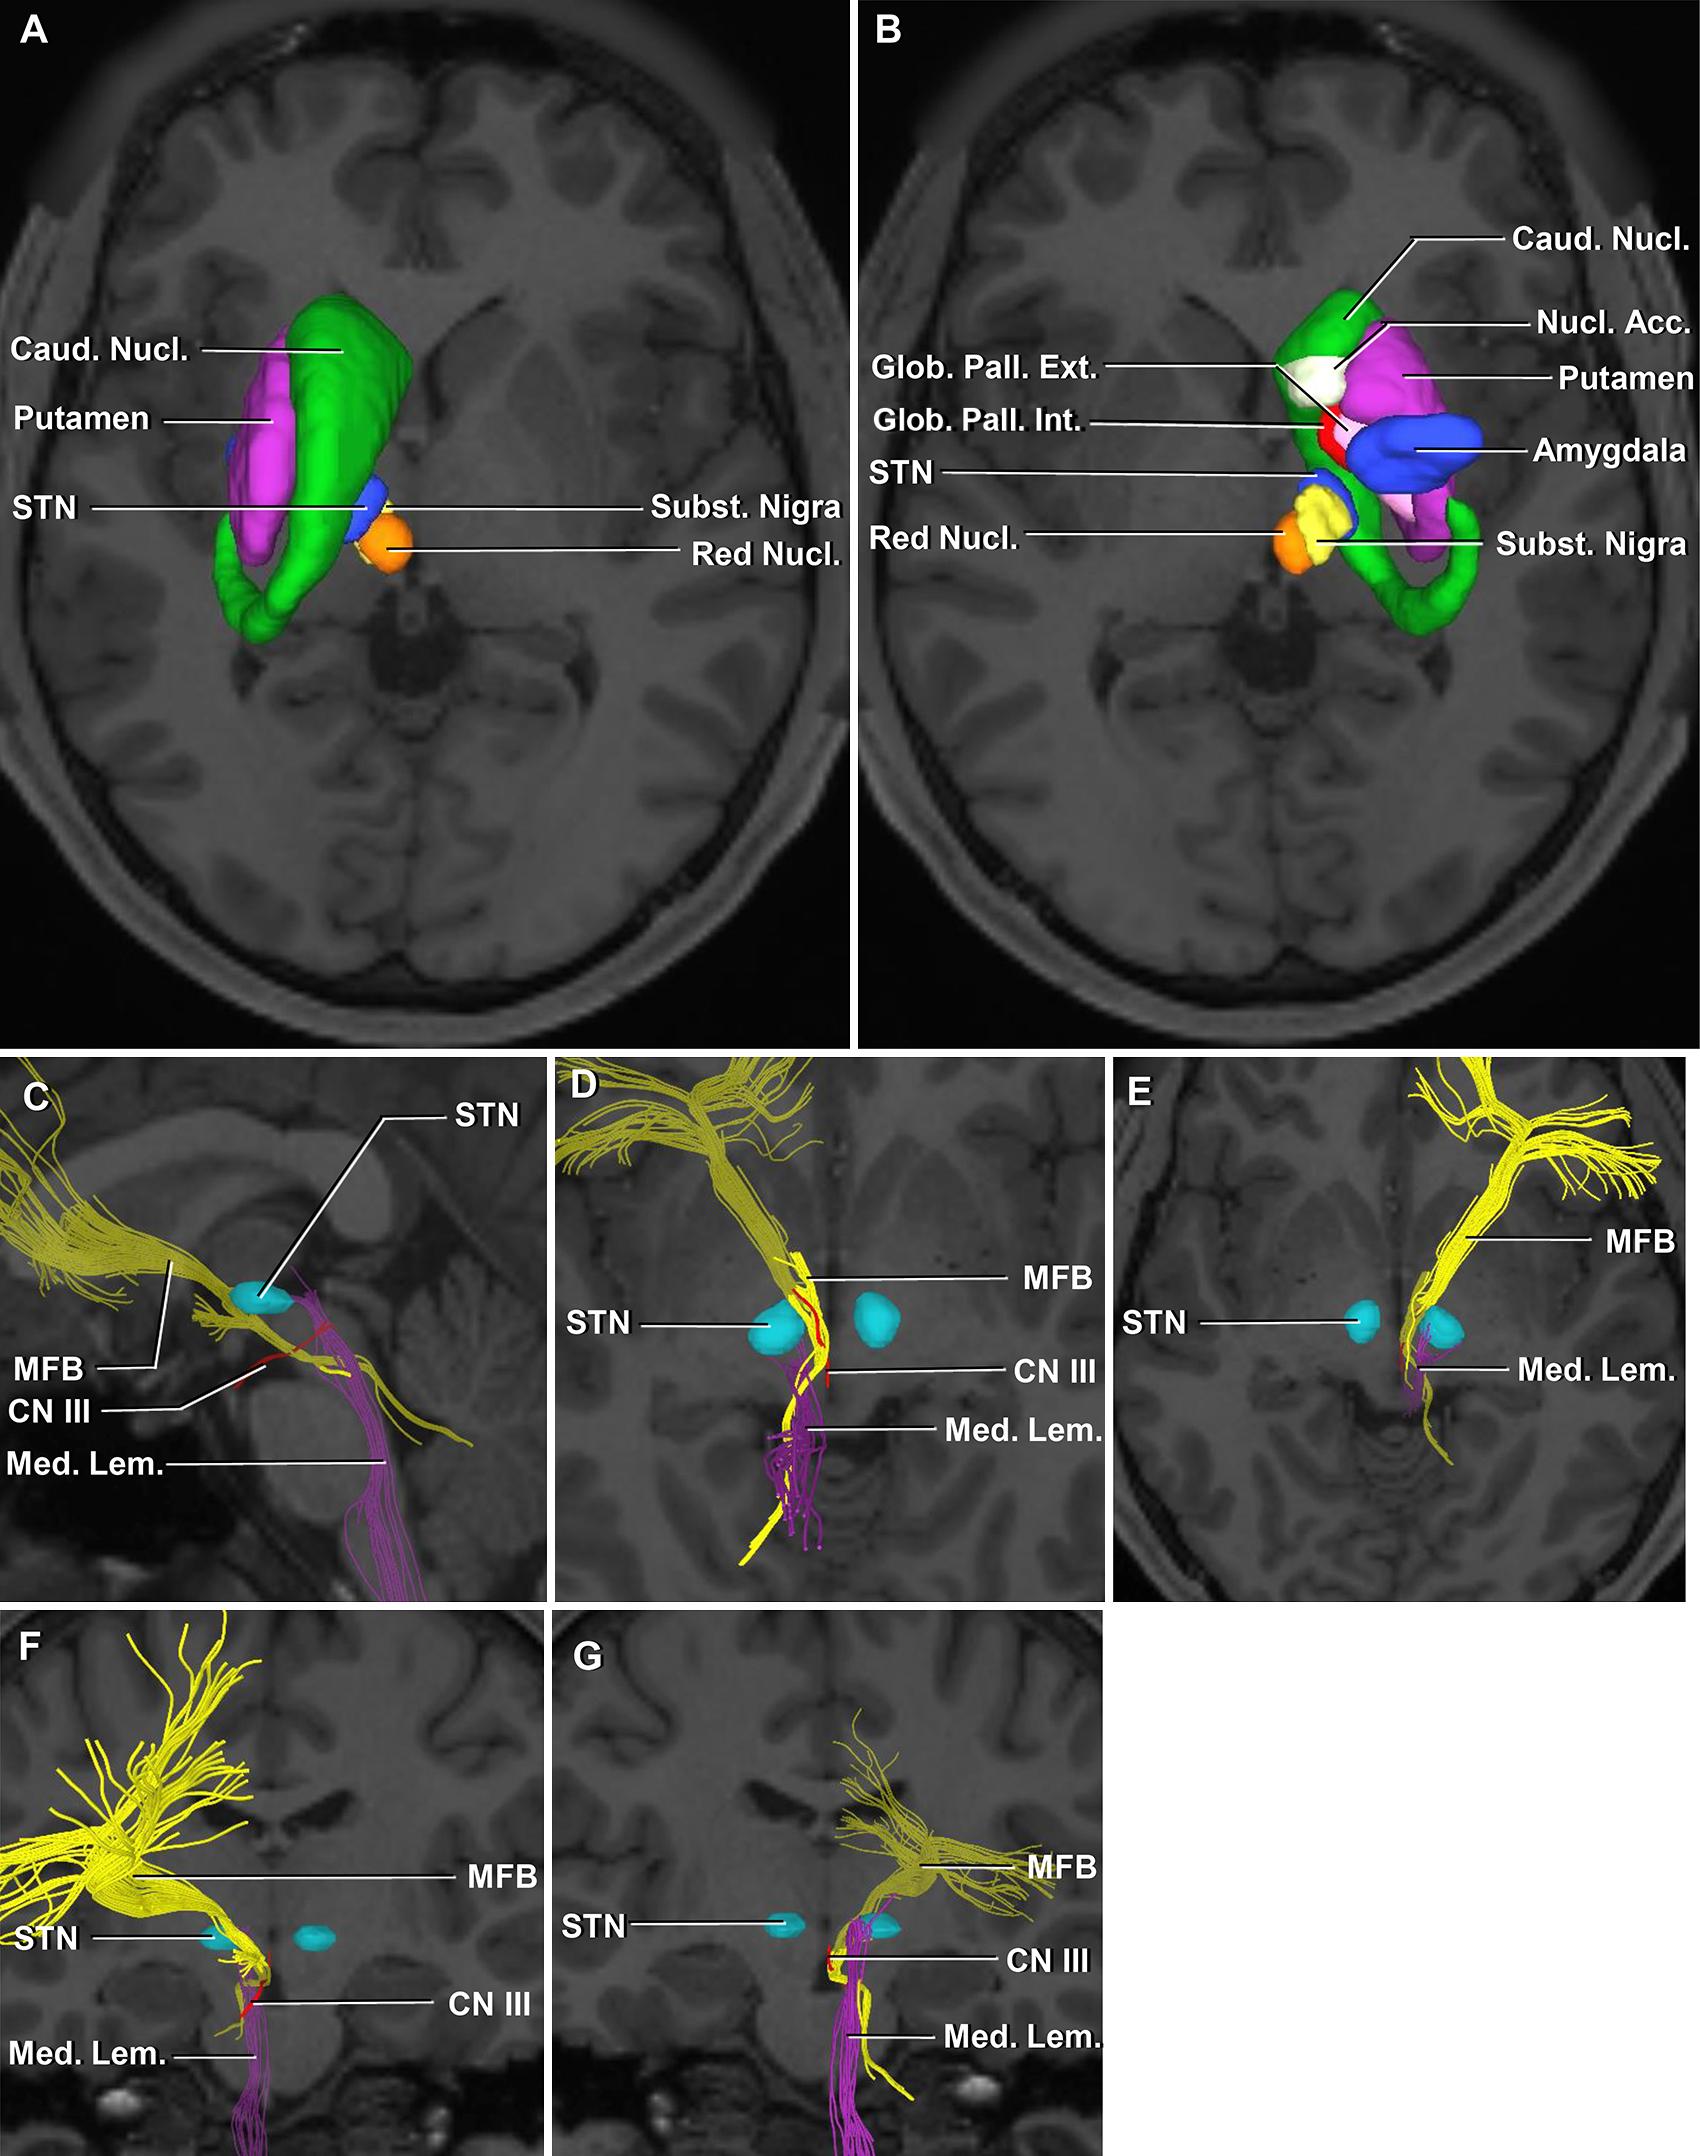 Microsurgical Anatomy Of The Subthalamic Nucleus Correlating Fiber